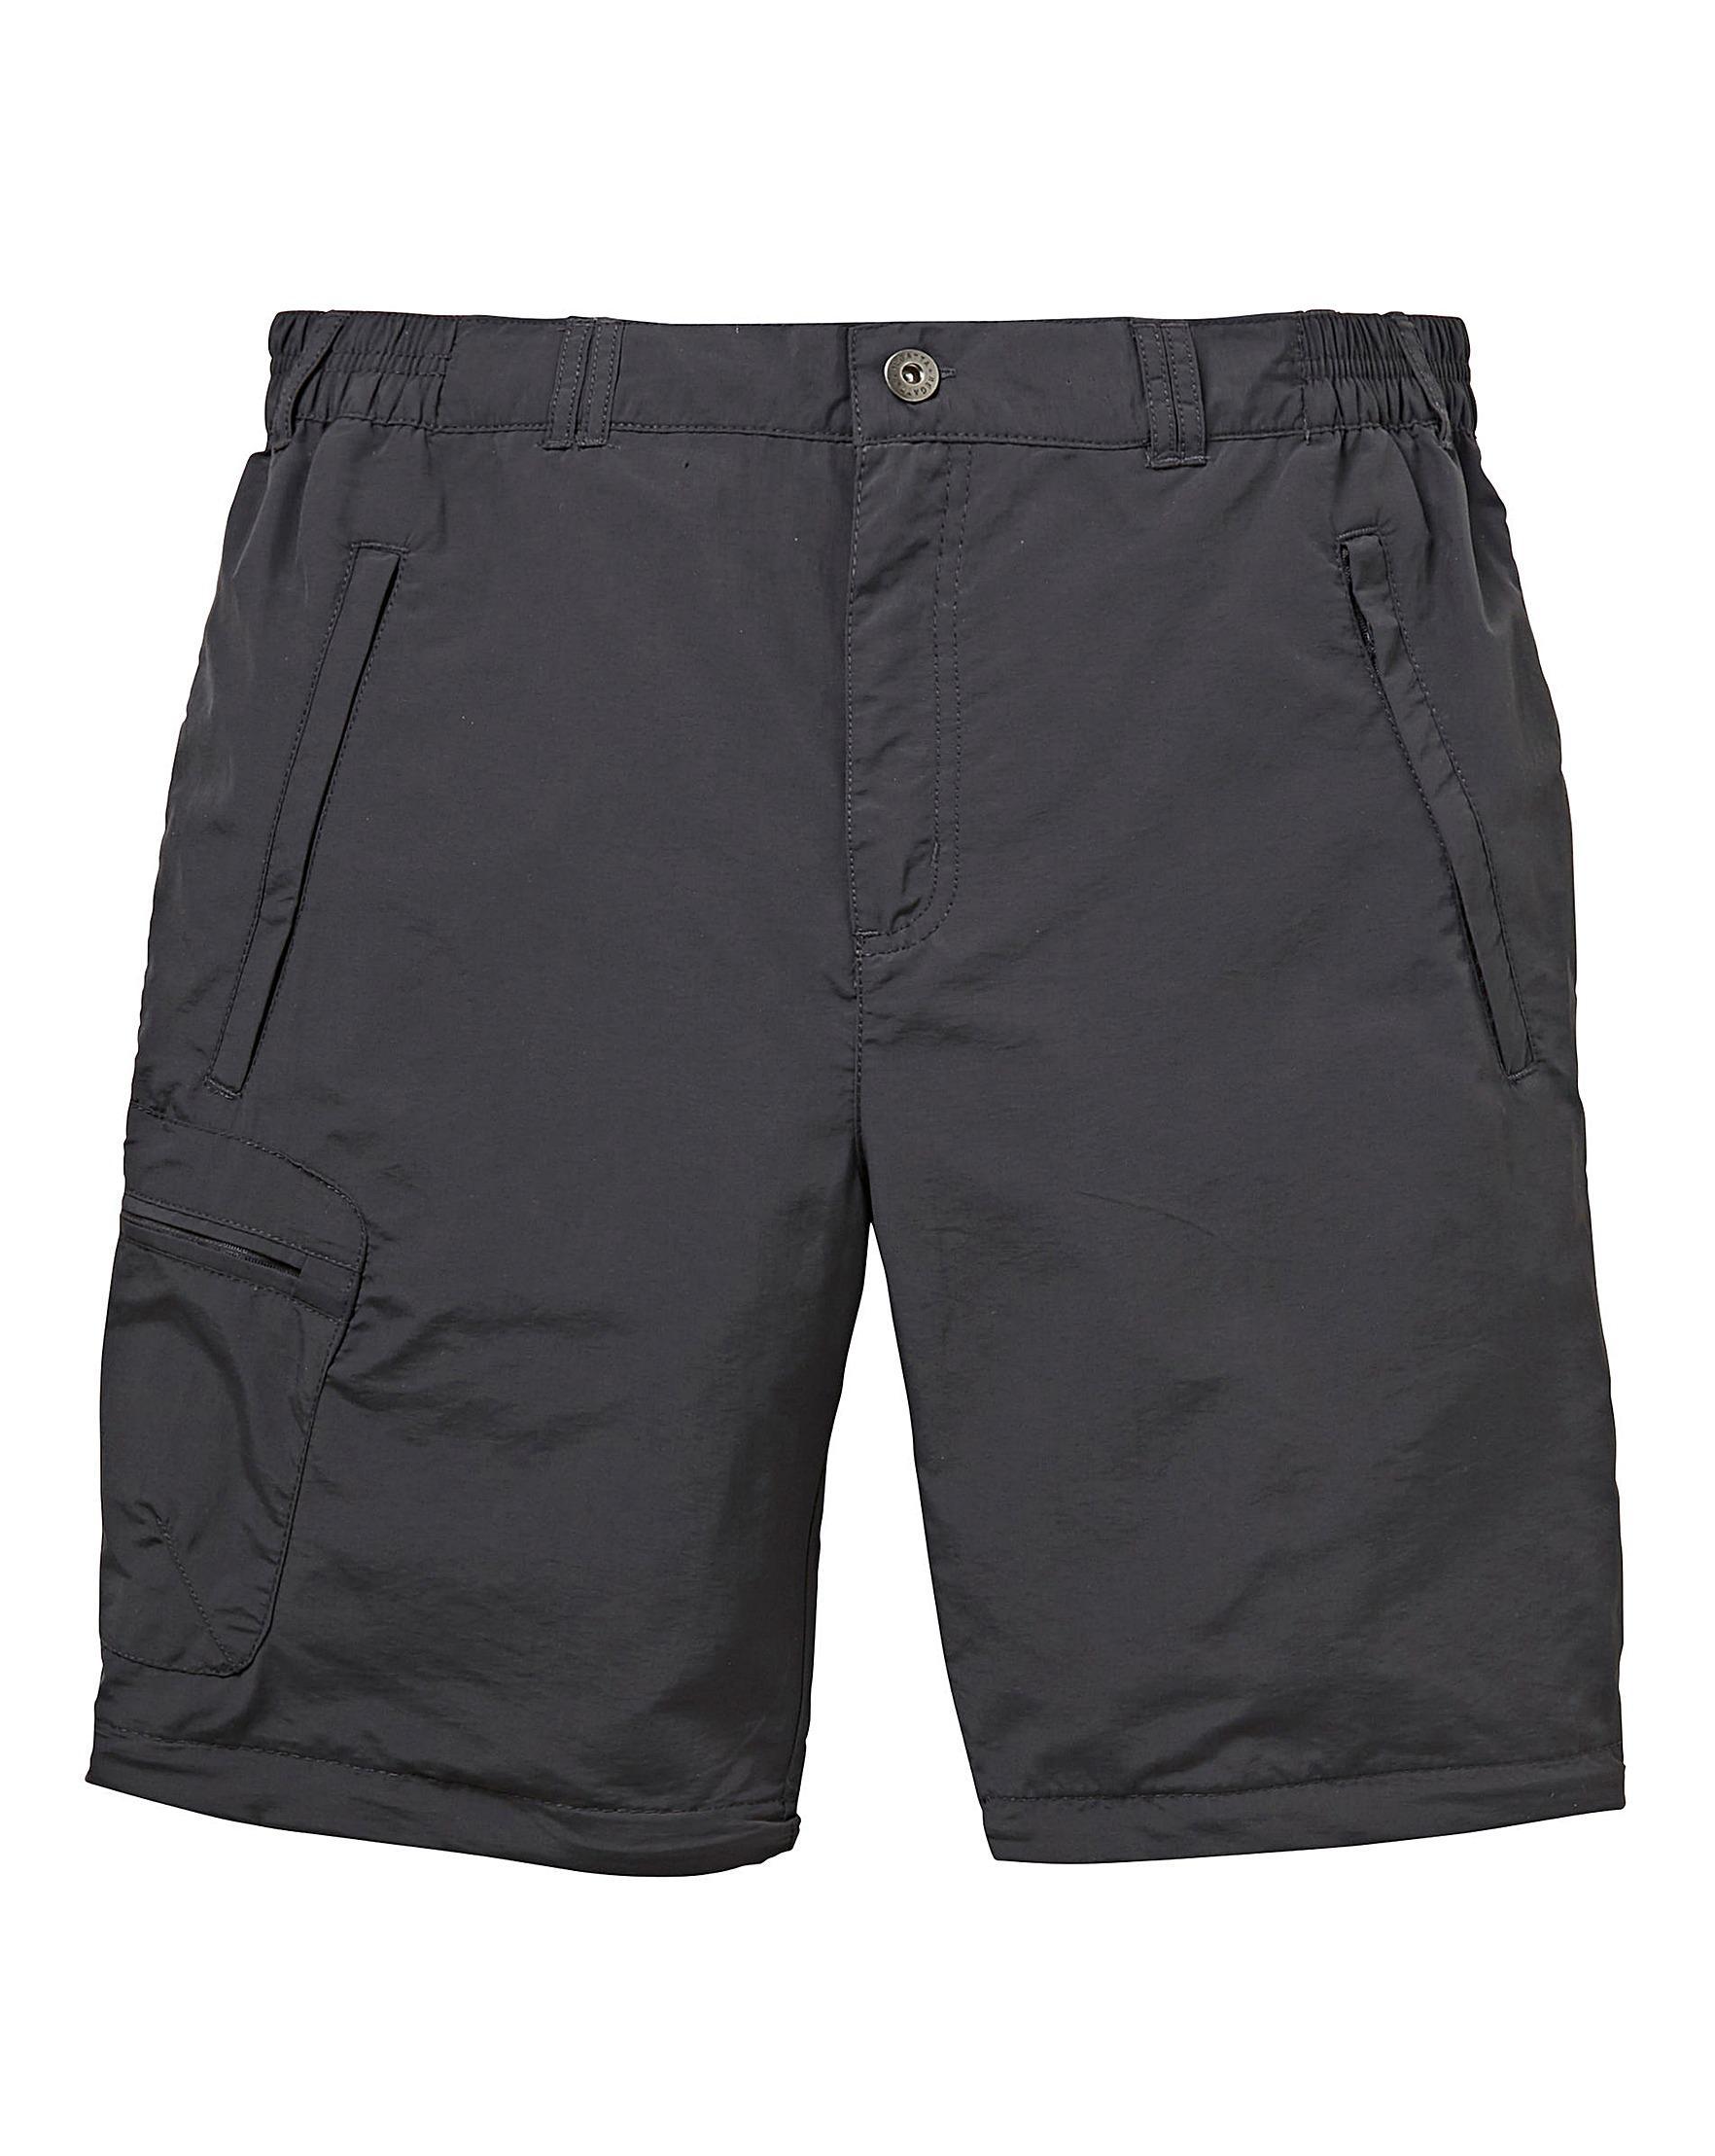 abafaa526a3 Men's Gray Leesville Zip Off Trousers 32in